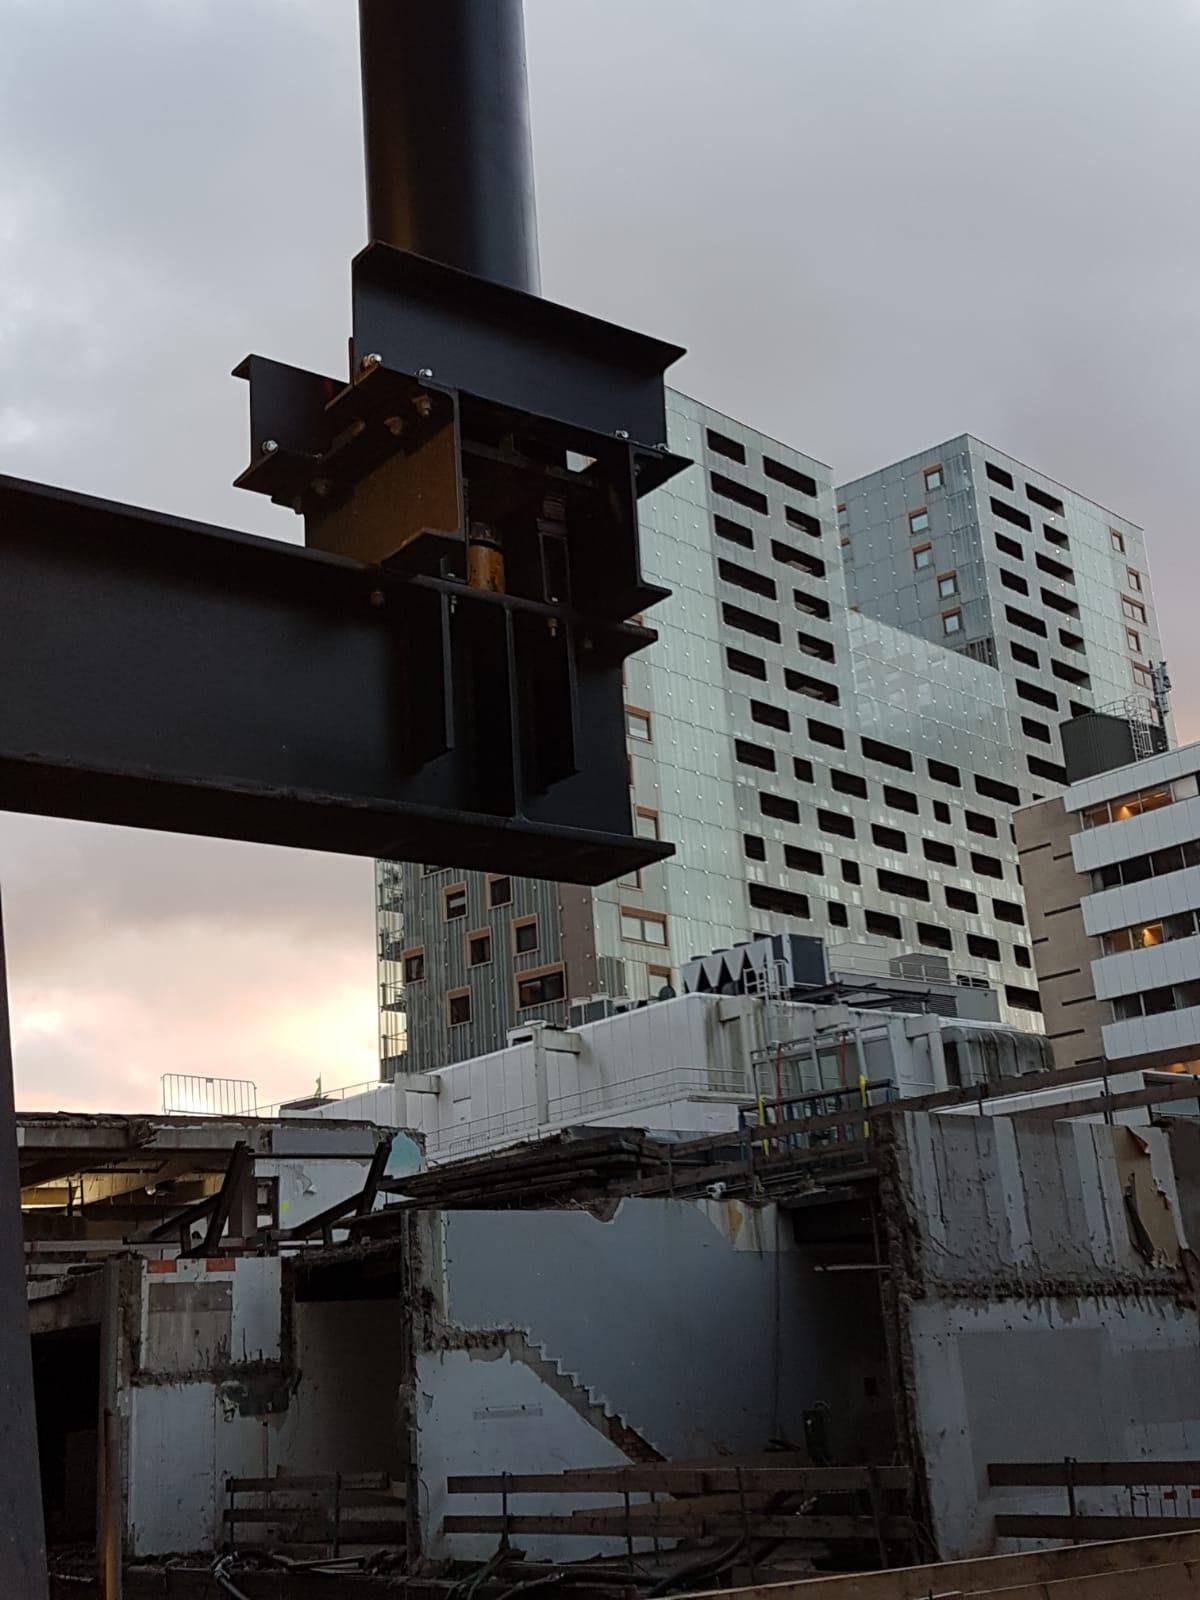 Forum, Rotterdam